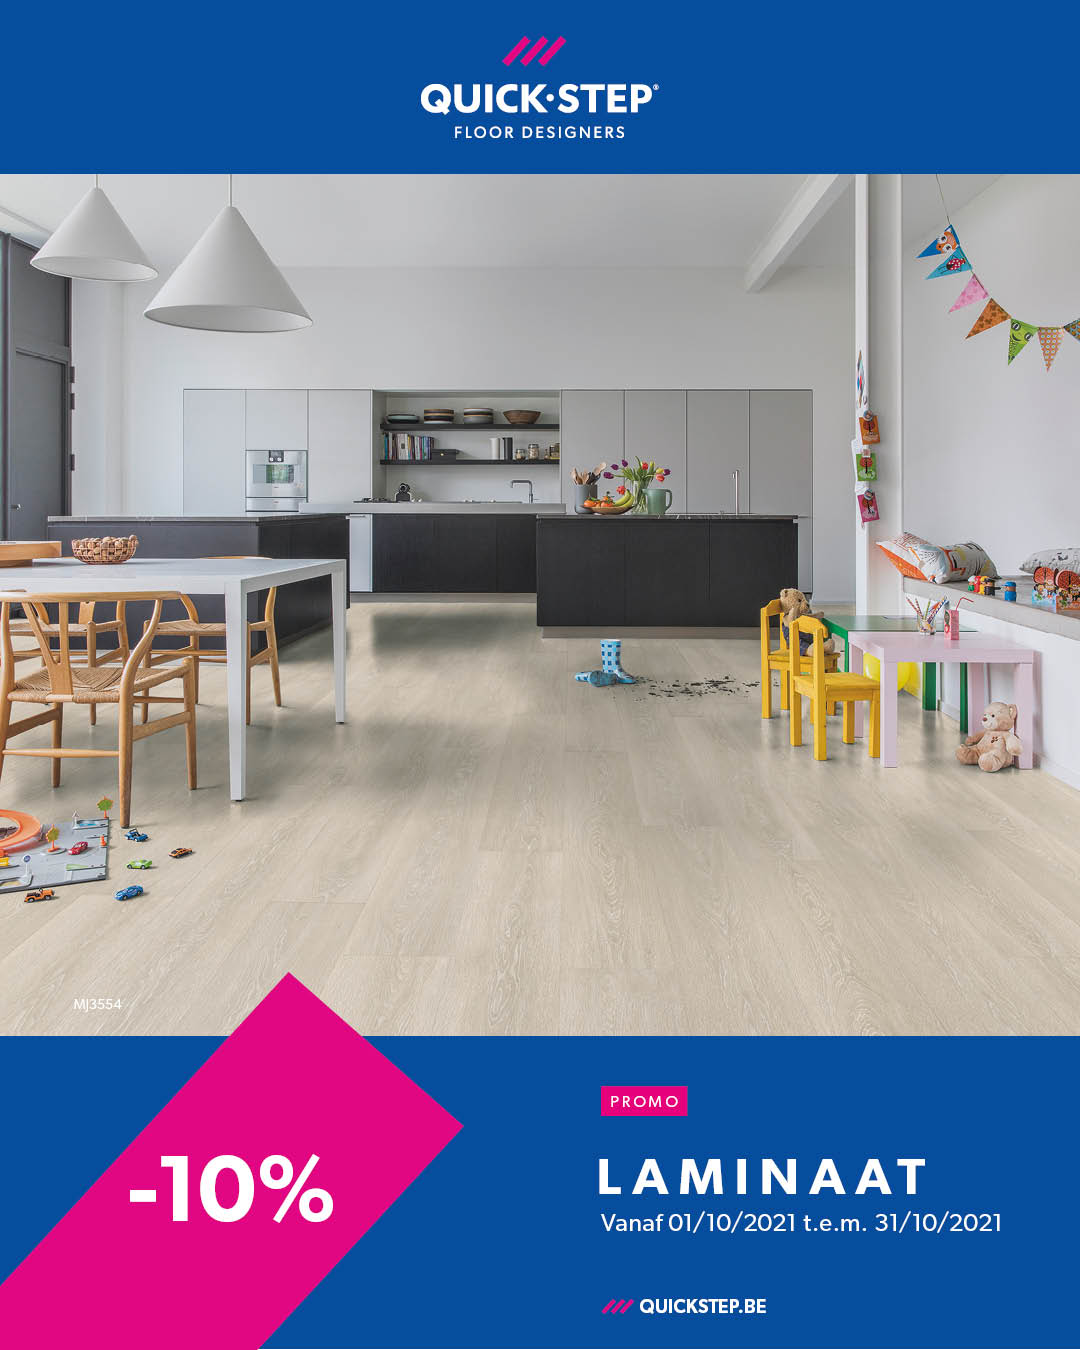 Promotie Quickstep Laminaat